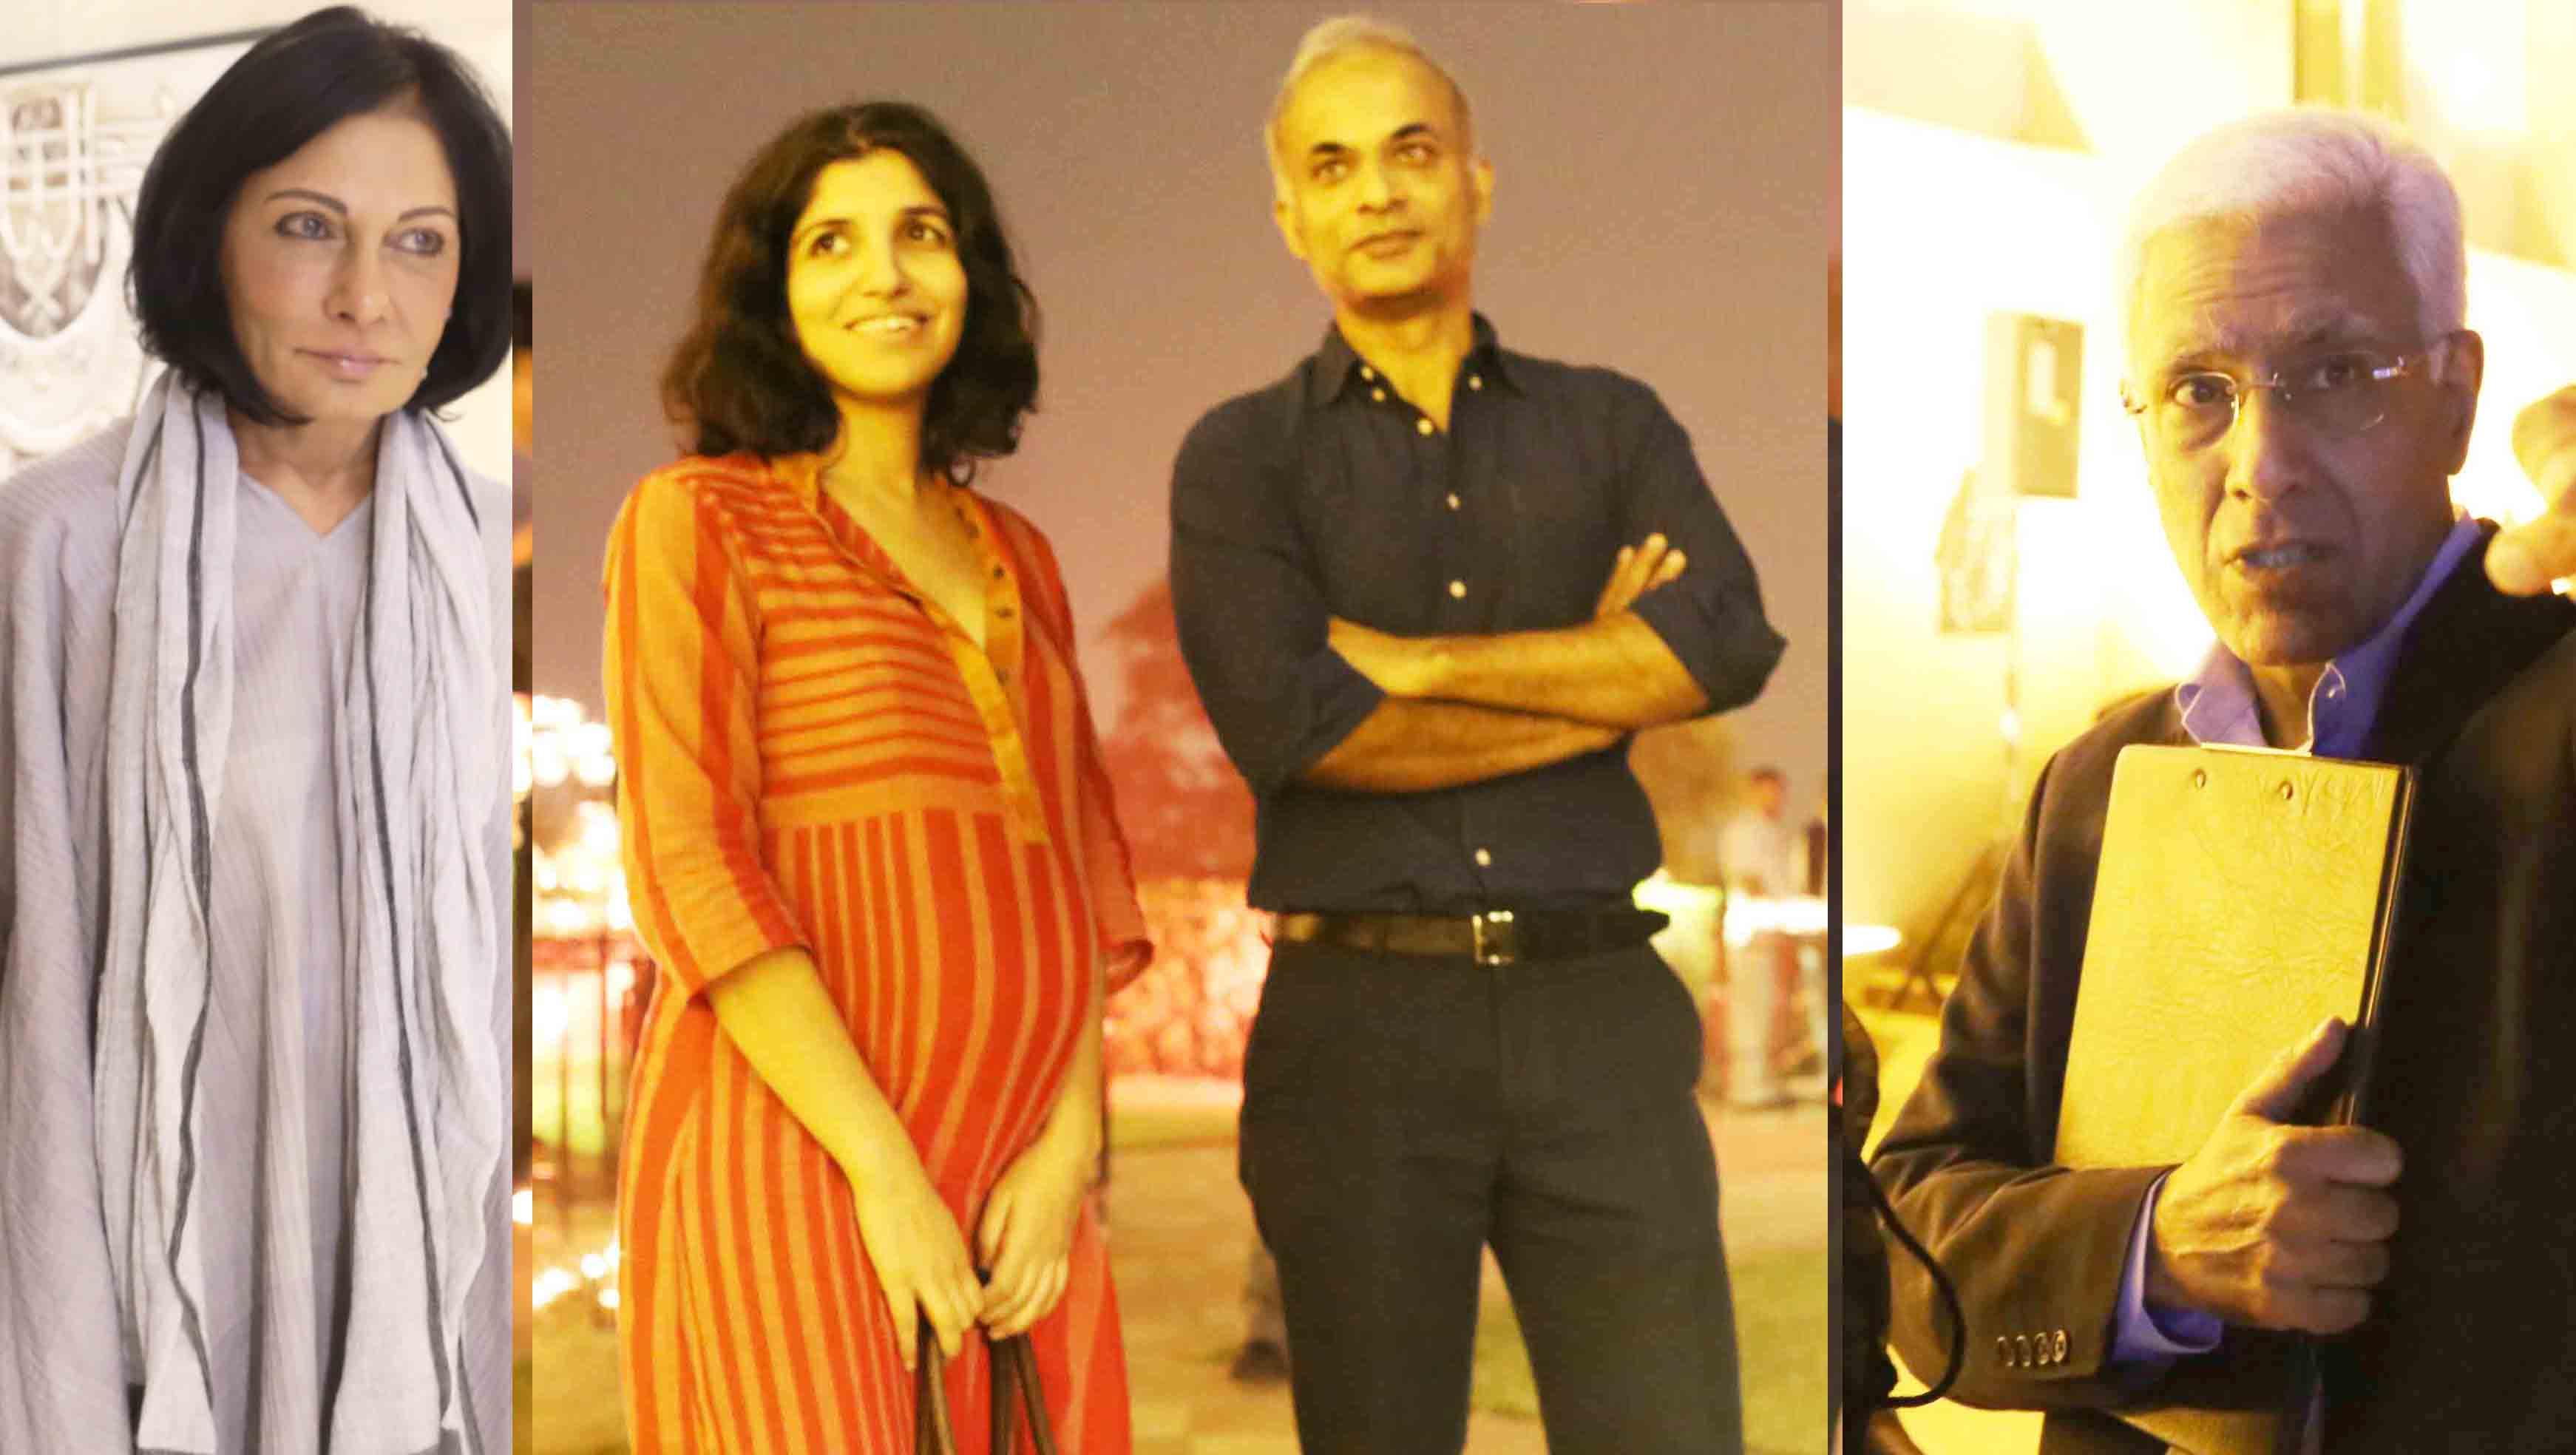 Netherfield Ball – Novelist Manu Joseph, Friend of Publisher Karthika V.K., Seen Cozying Up To Publisher Chiki Sarkar at Shashi Tharoor's Book launch, The Taj Mahal Hotel